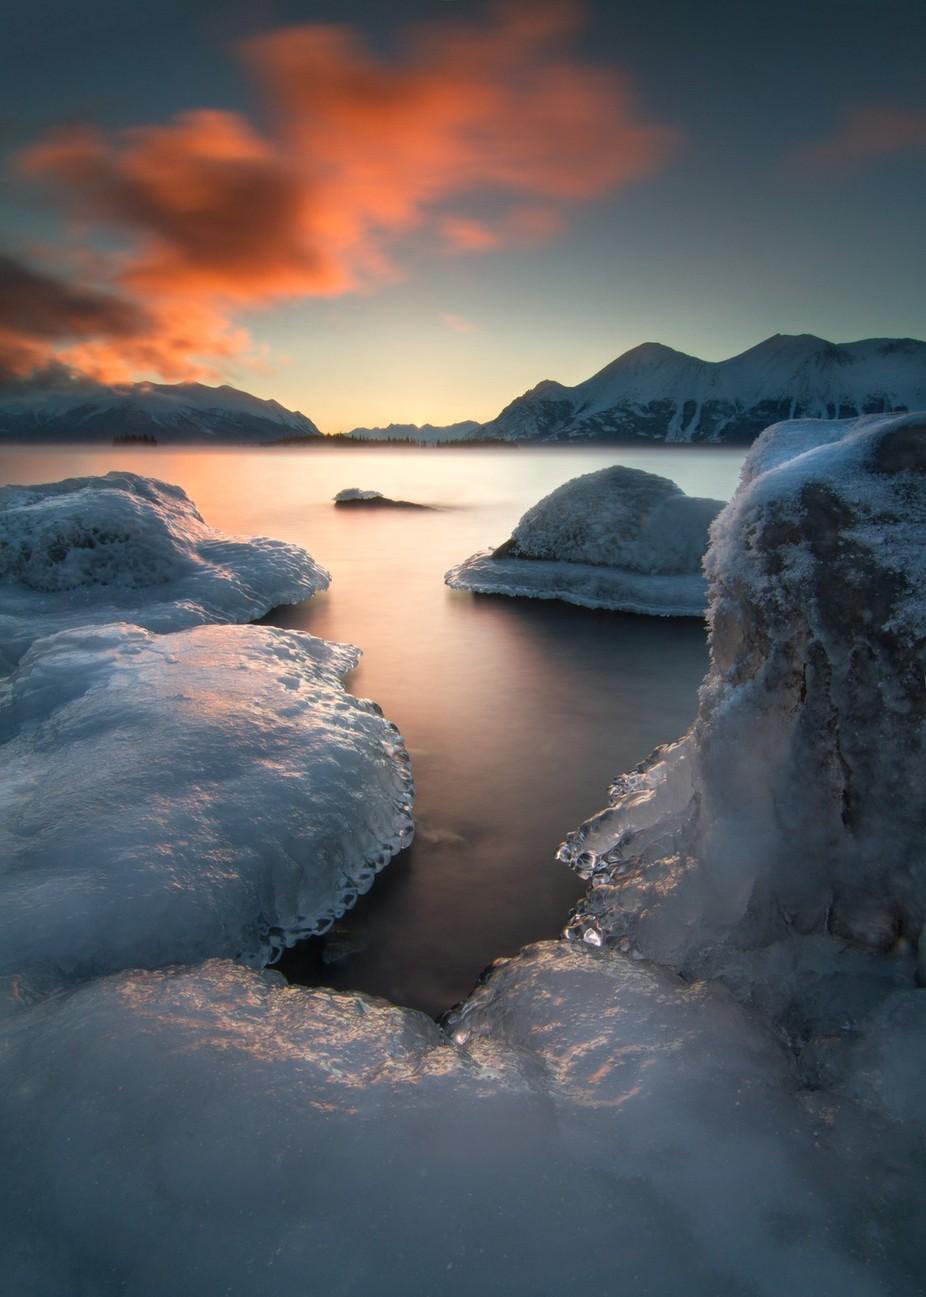 Midwinters Dream by ManuKeggenhoff - Unforgettable Landscapes Photo Contest by Zenfolio